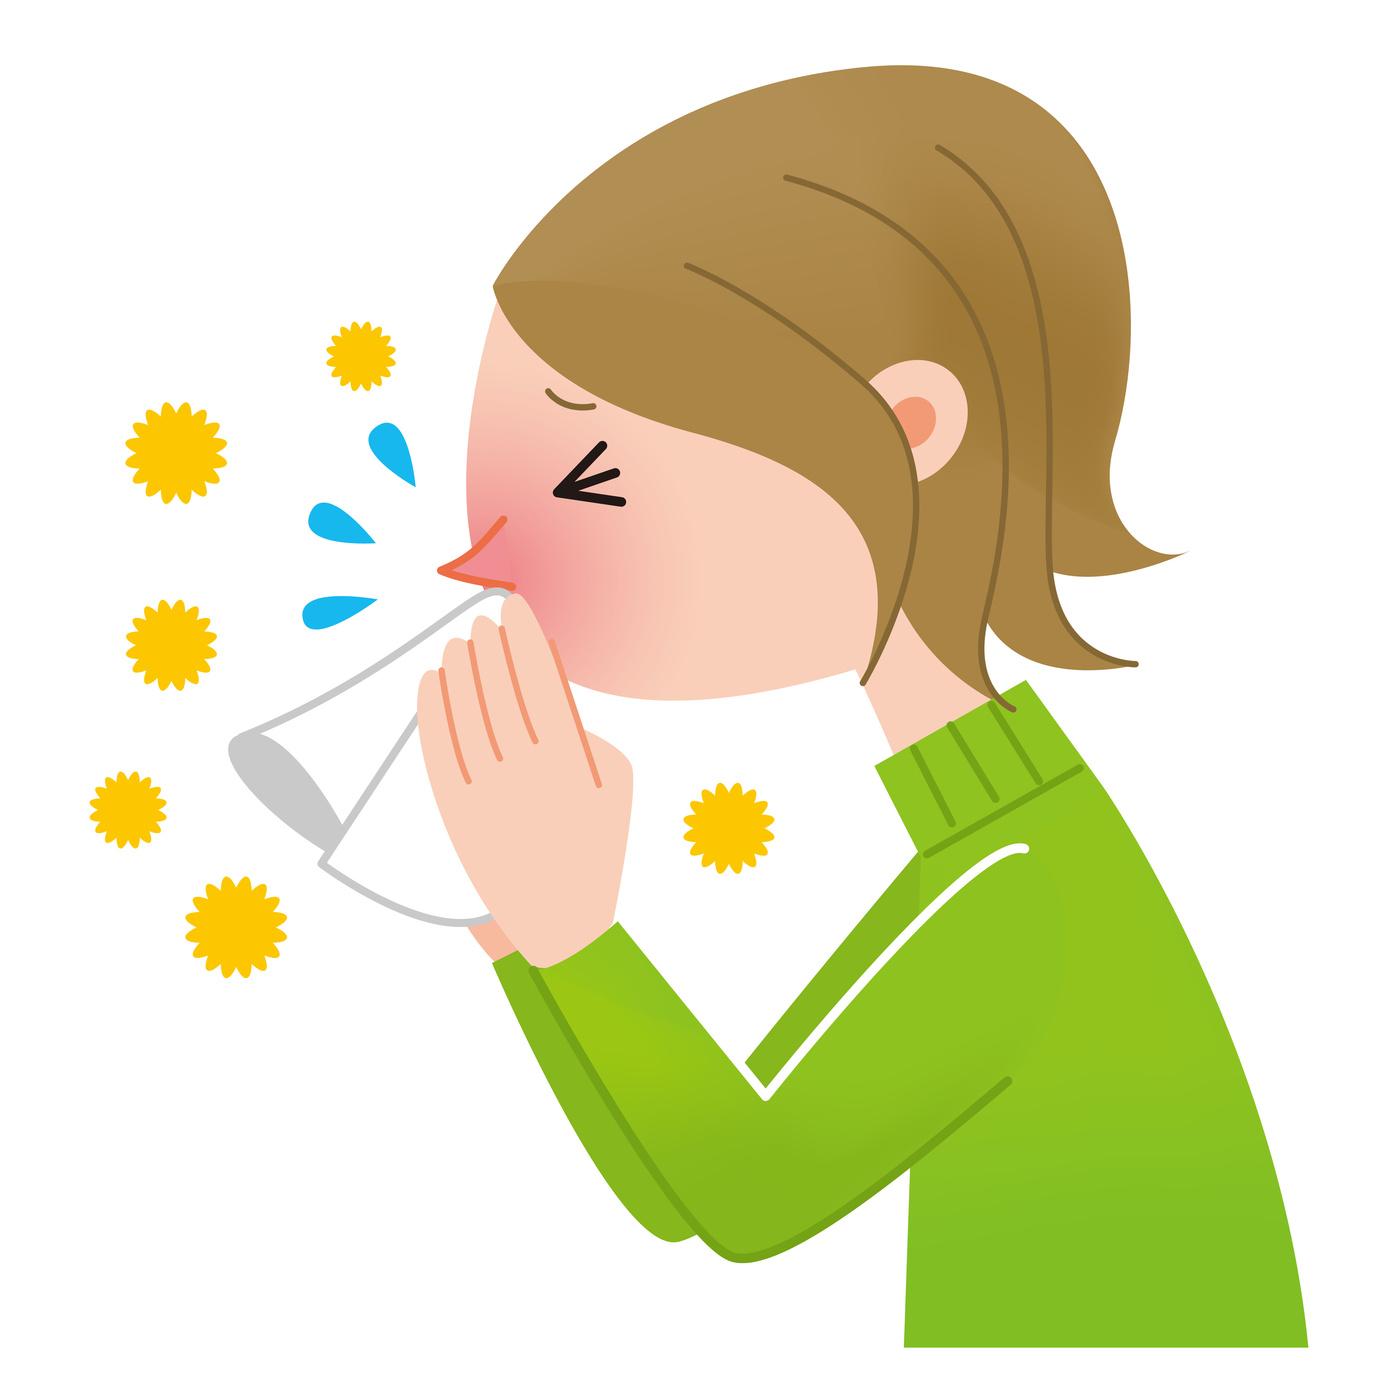 Flu clipart pictures picture stock Flu Clip Art Free | Clipart Panda - Free Clipart Images picture stock